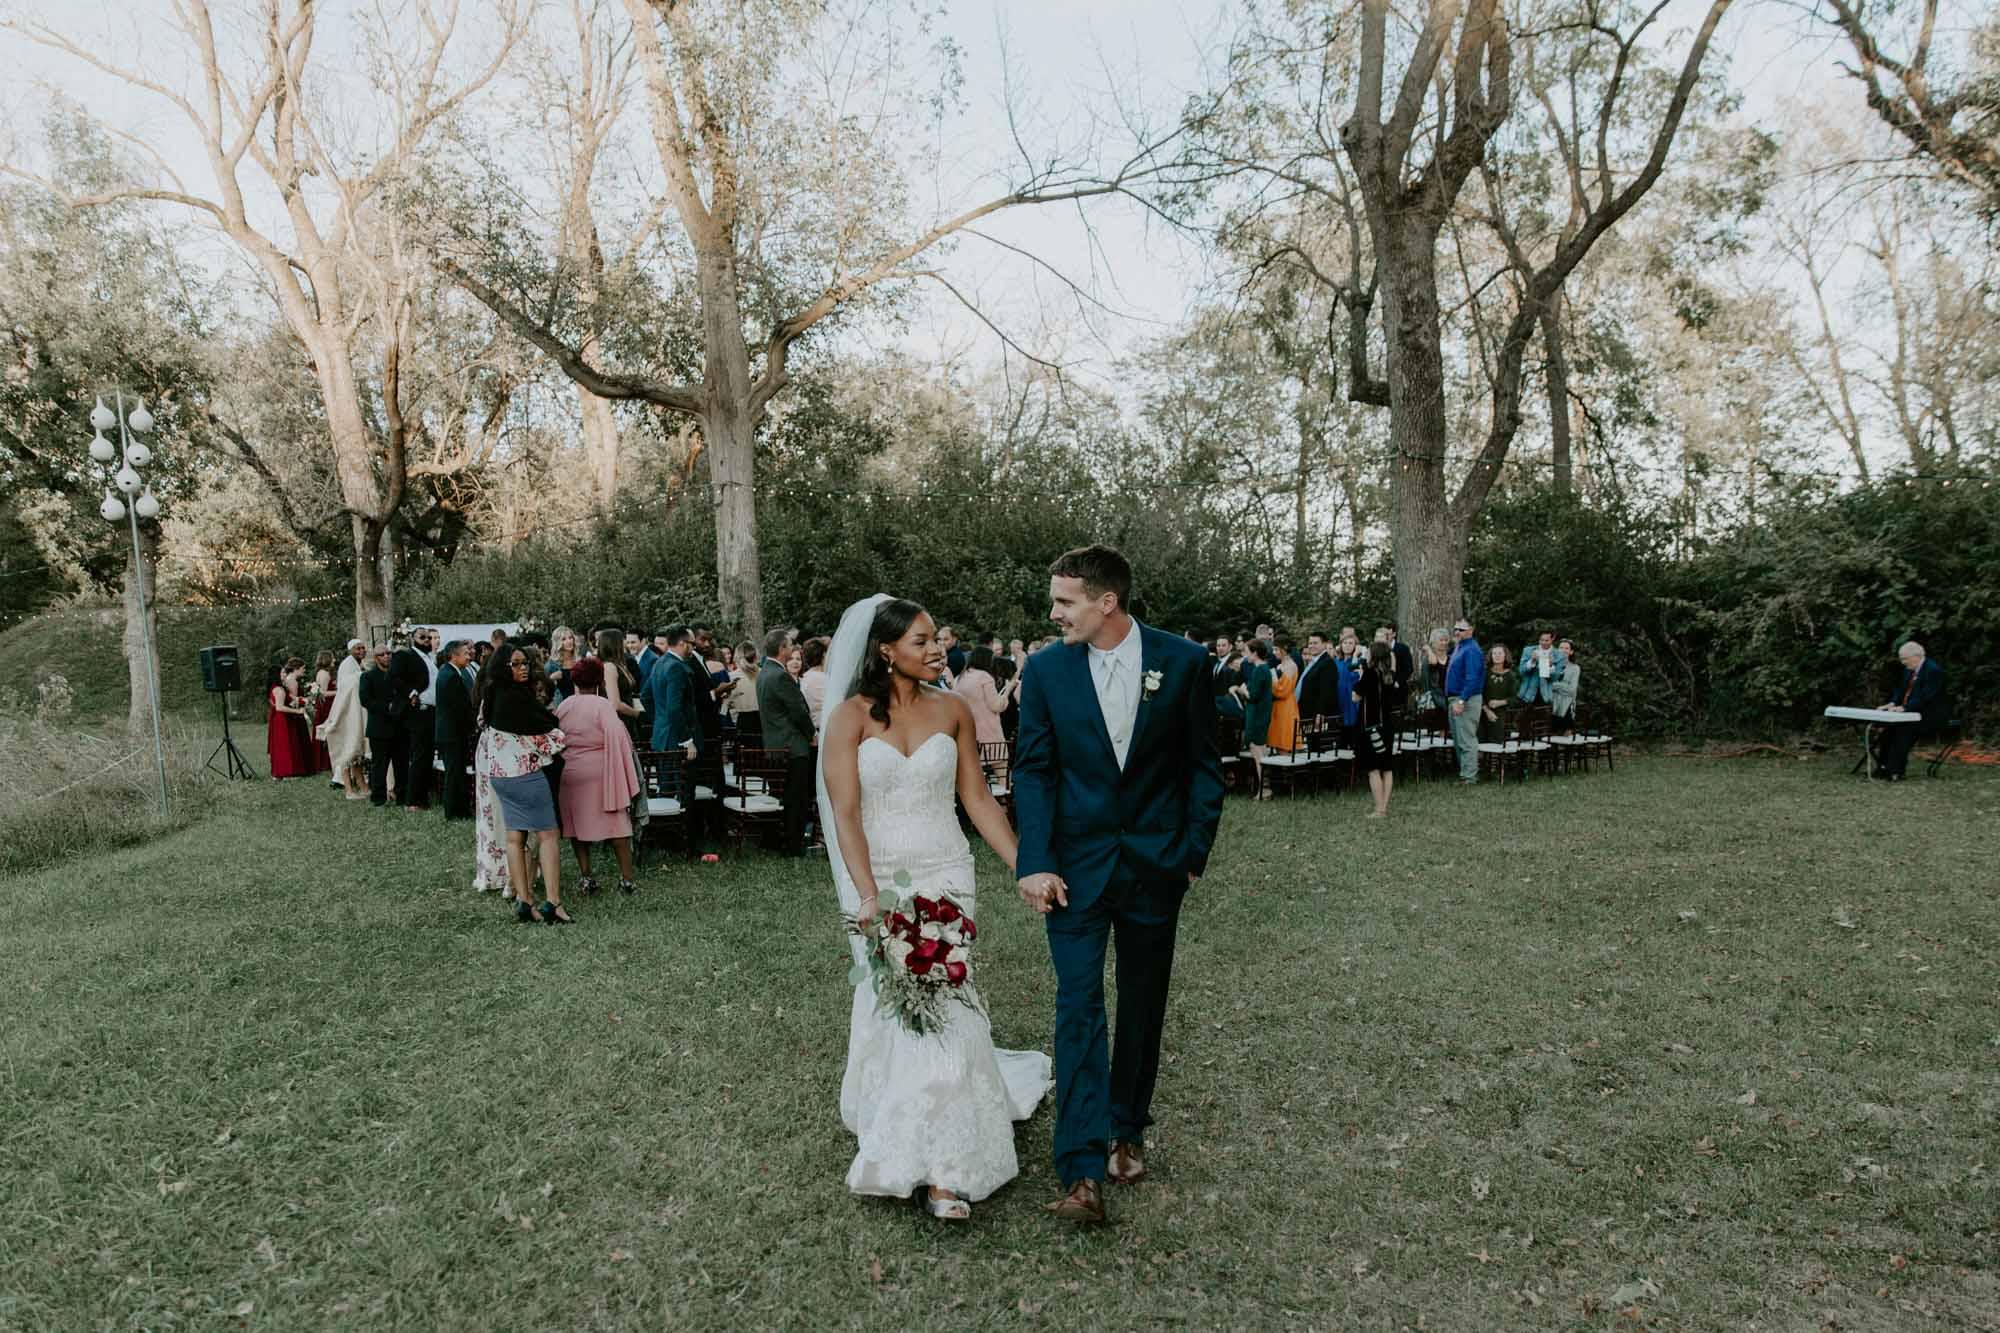 prairie_glass_house_wedding_champaign_wright_photographs_simon_0086.jpg